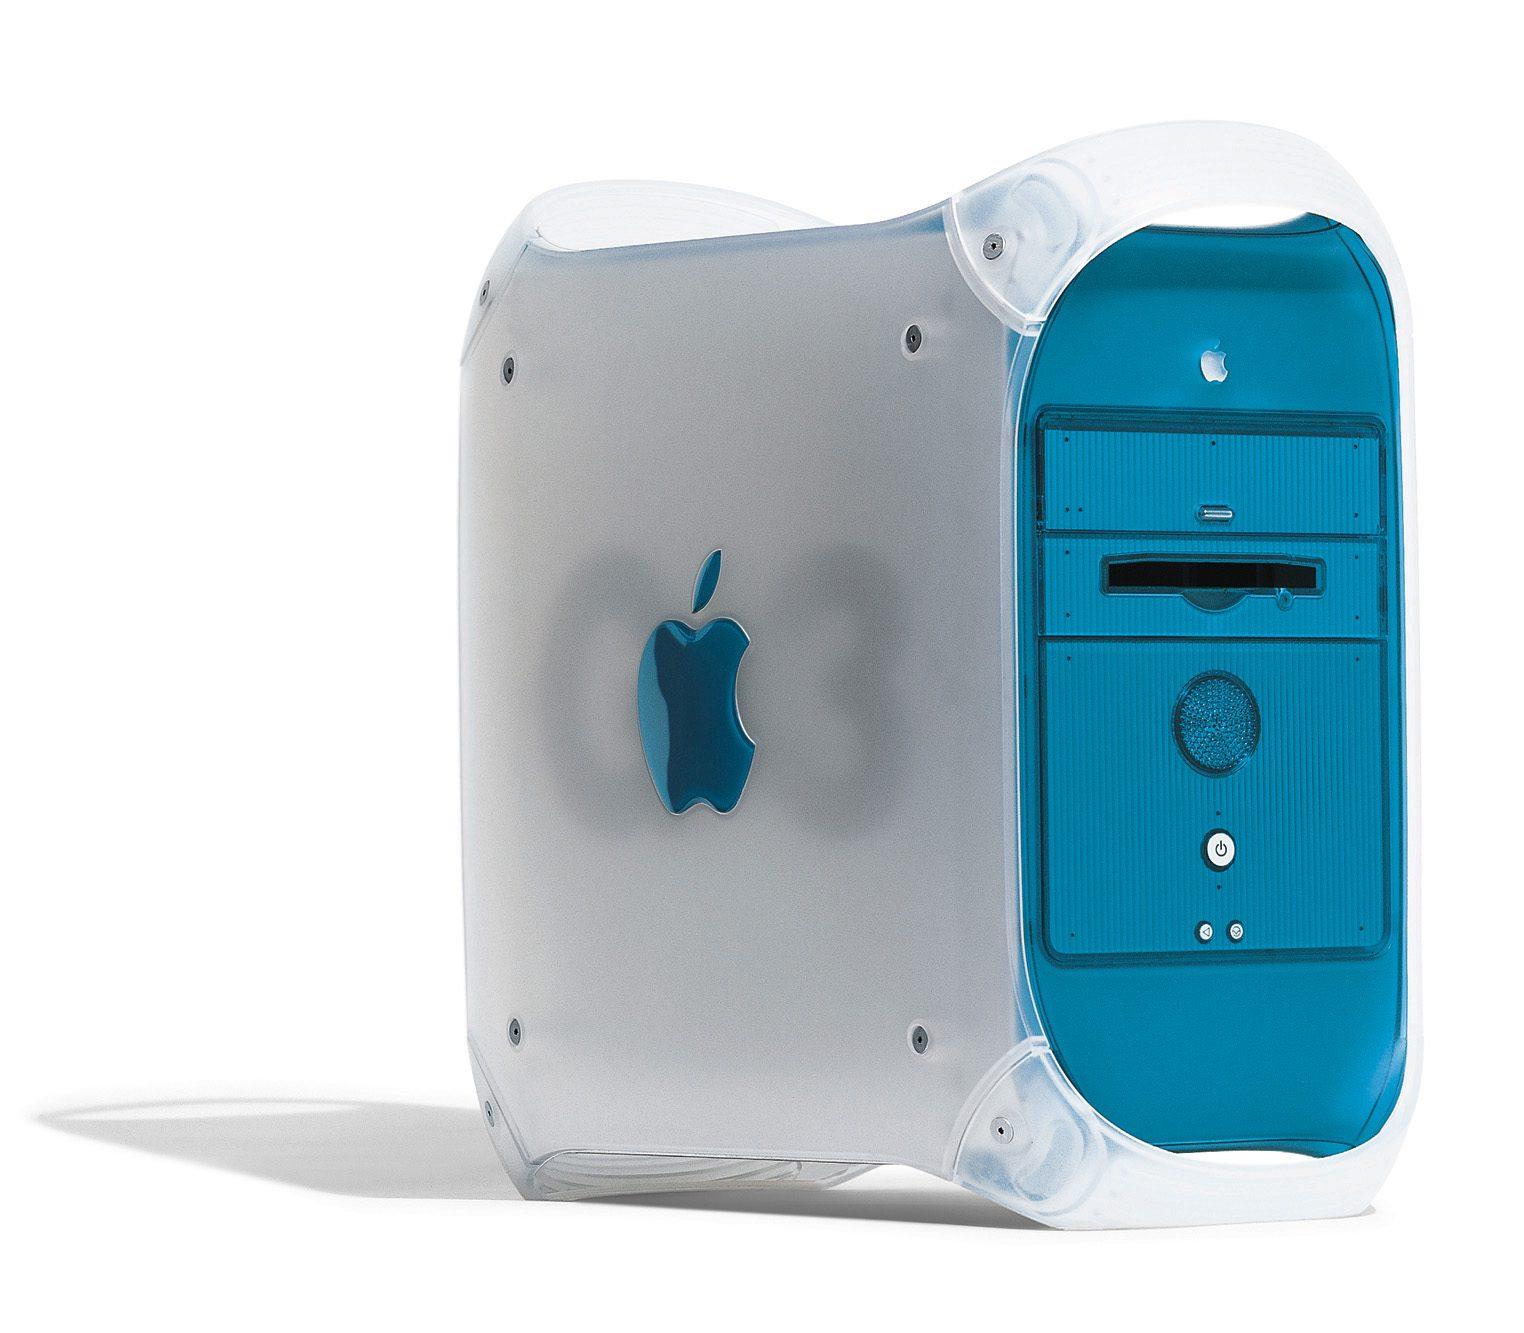 Power Macintosh G3